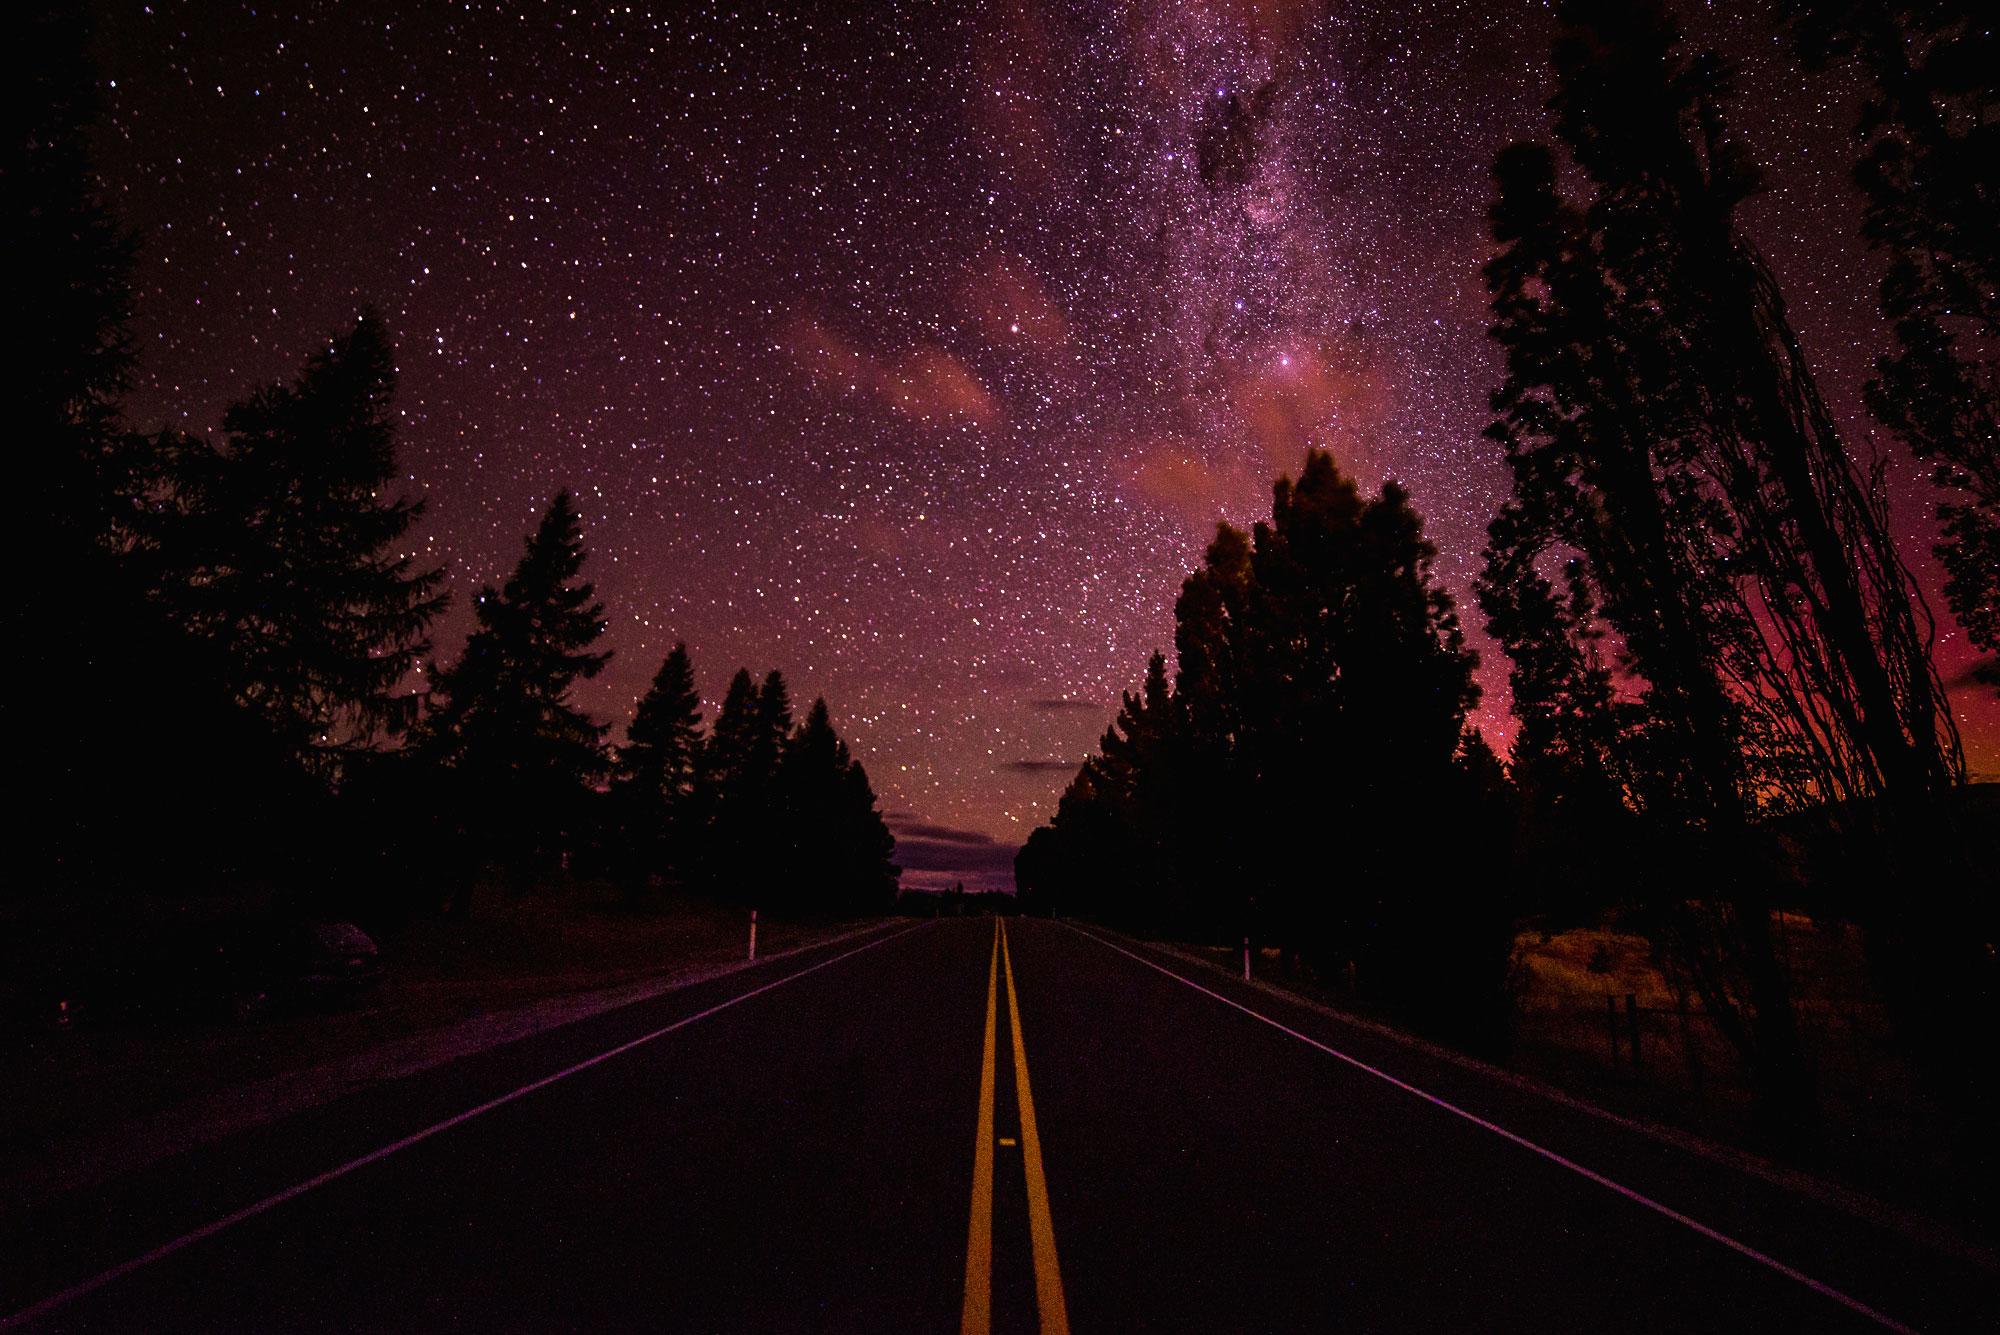 Starry night sky, Rabrosa Station, New Zealand